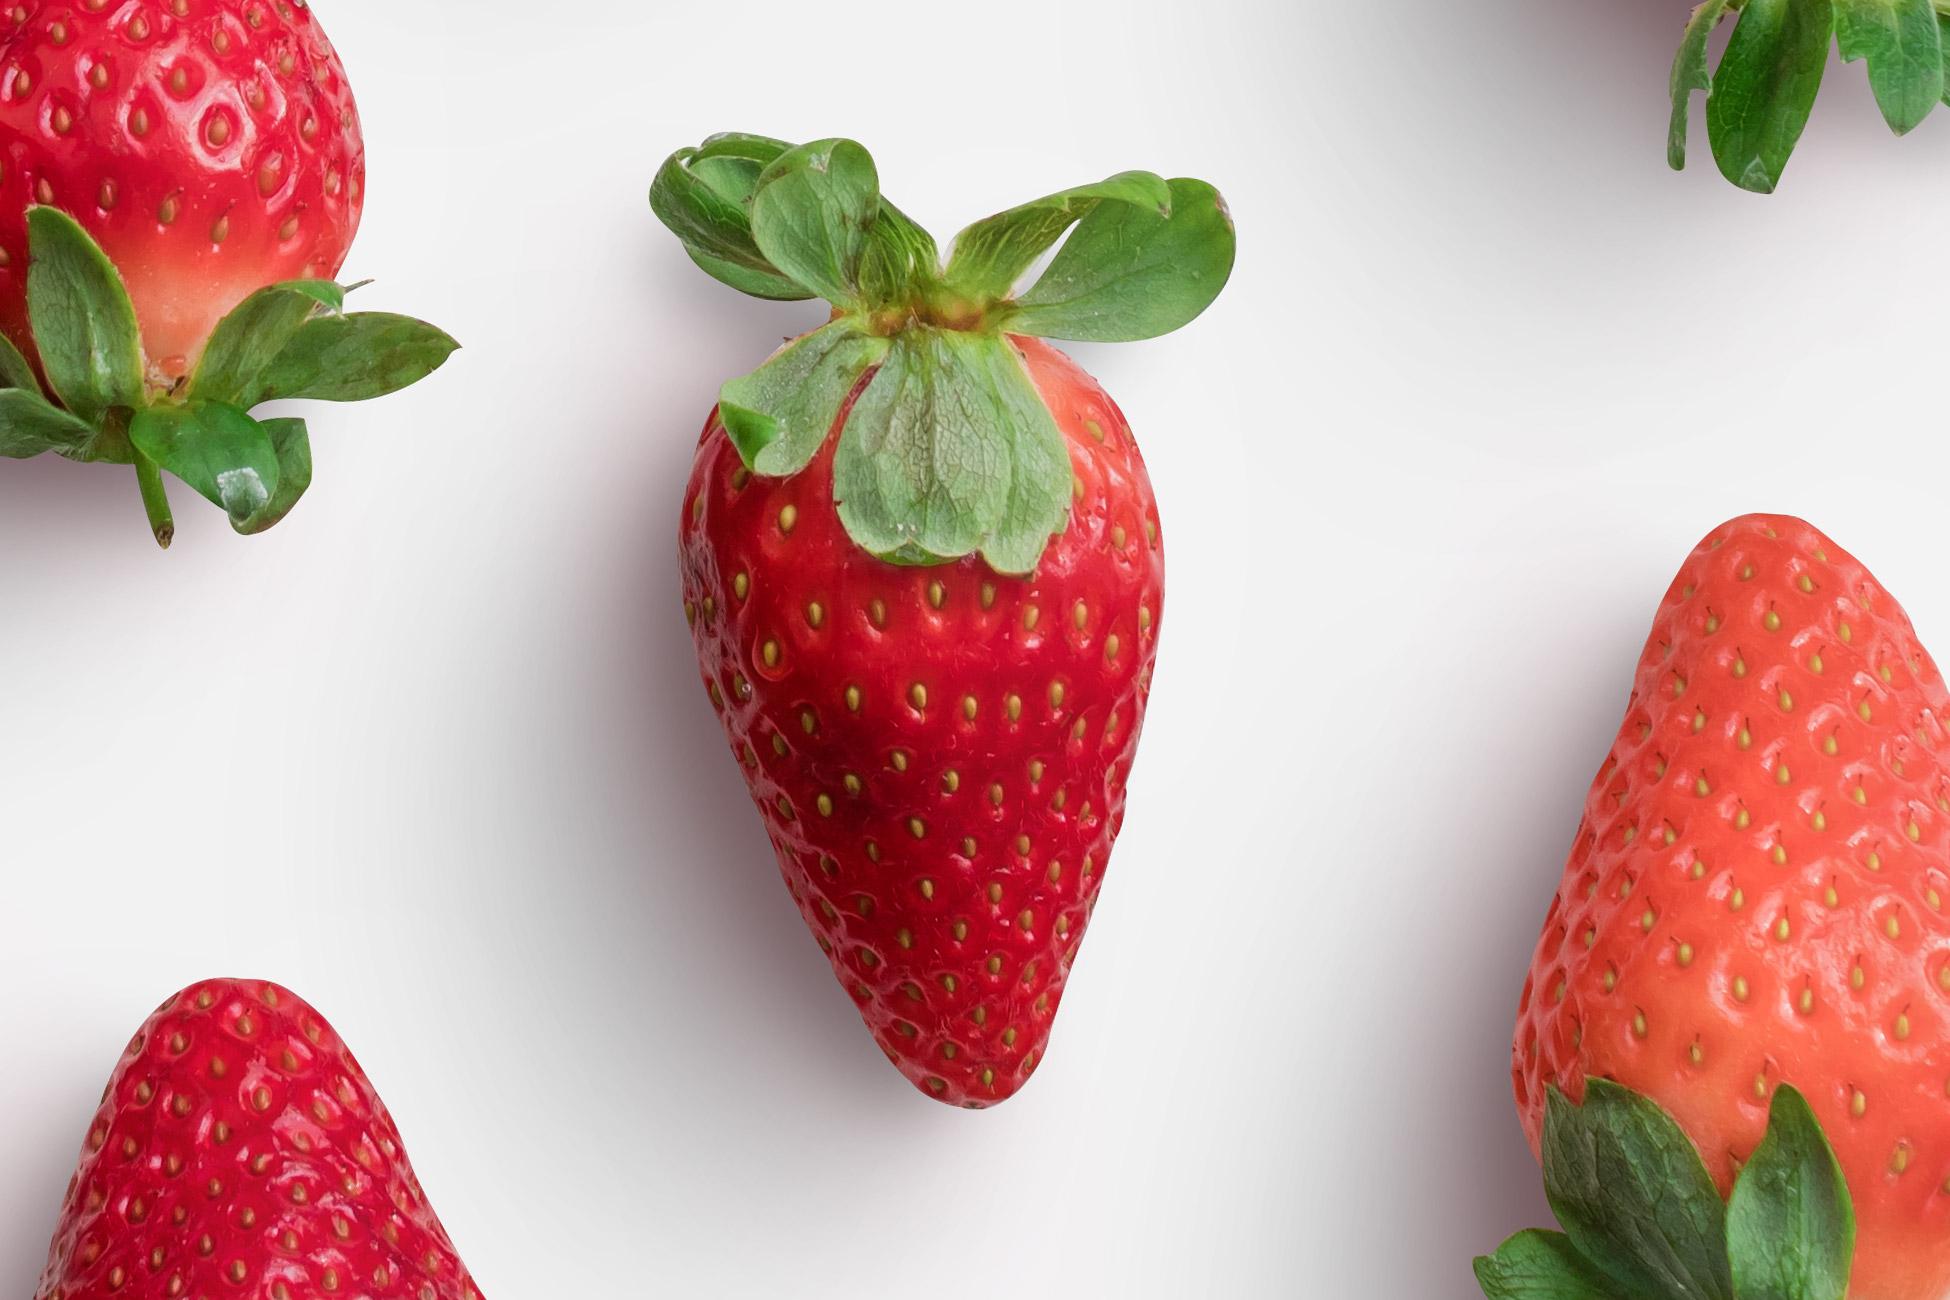 Strawberries Fruit High Resolution